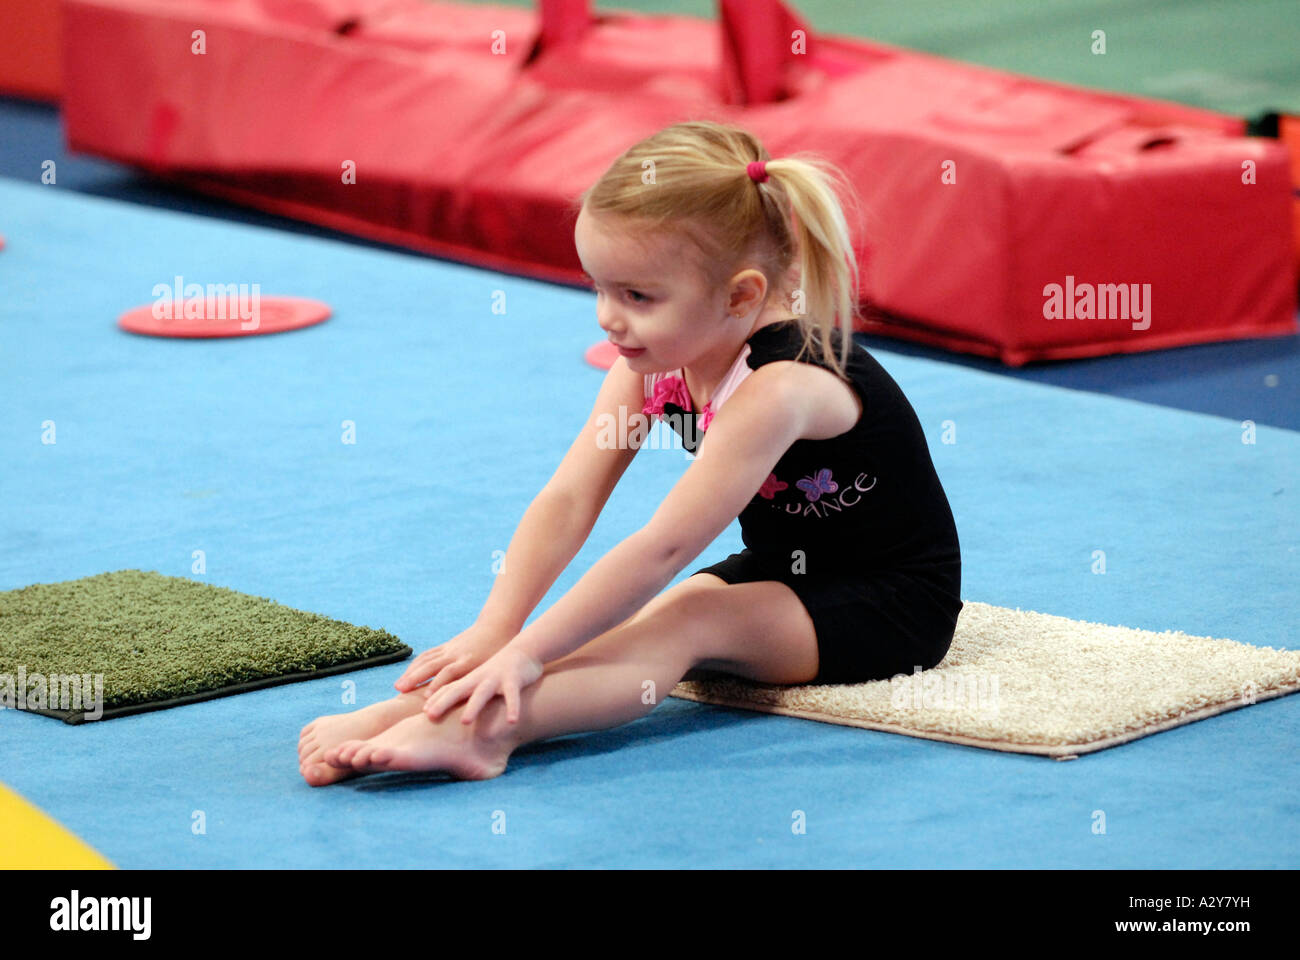 Three And Four Year Old Girls Take A Beginning Gymnastics